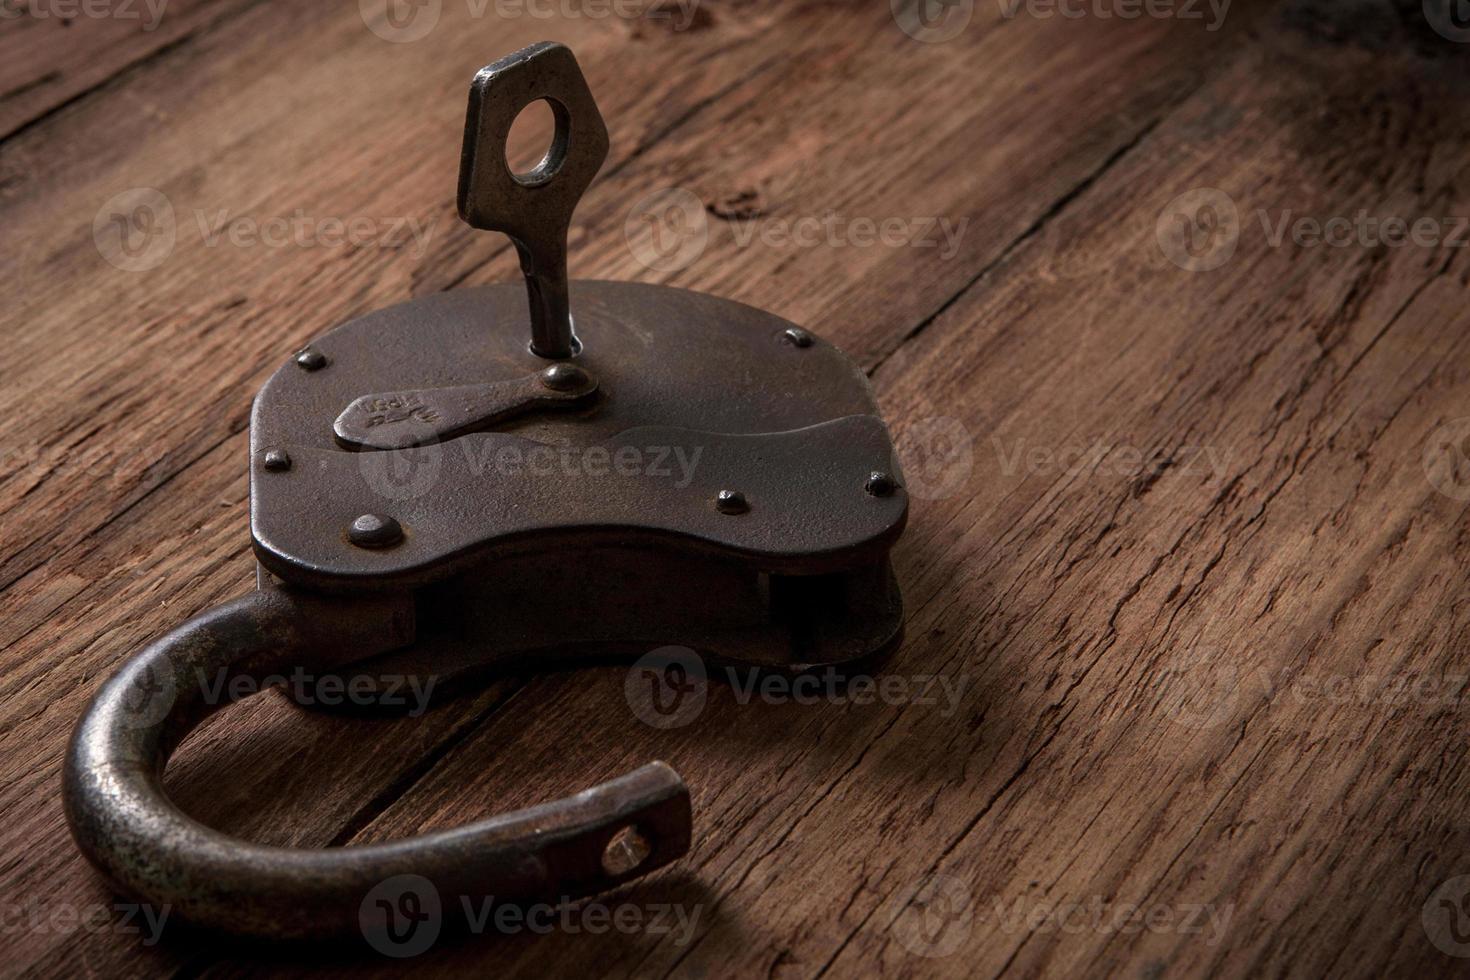 Key and rusty lock photo